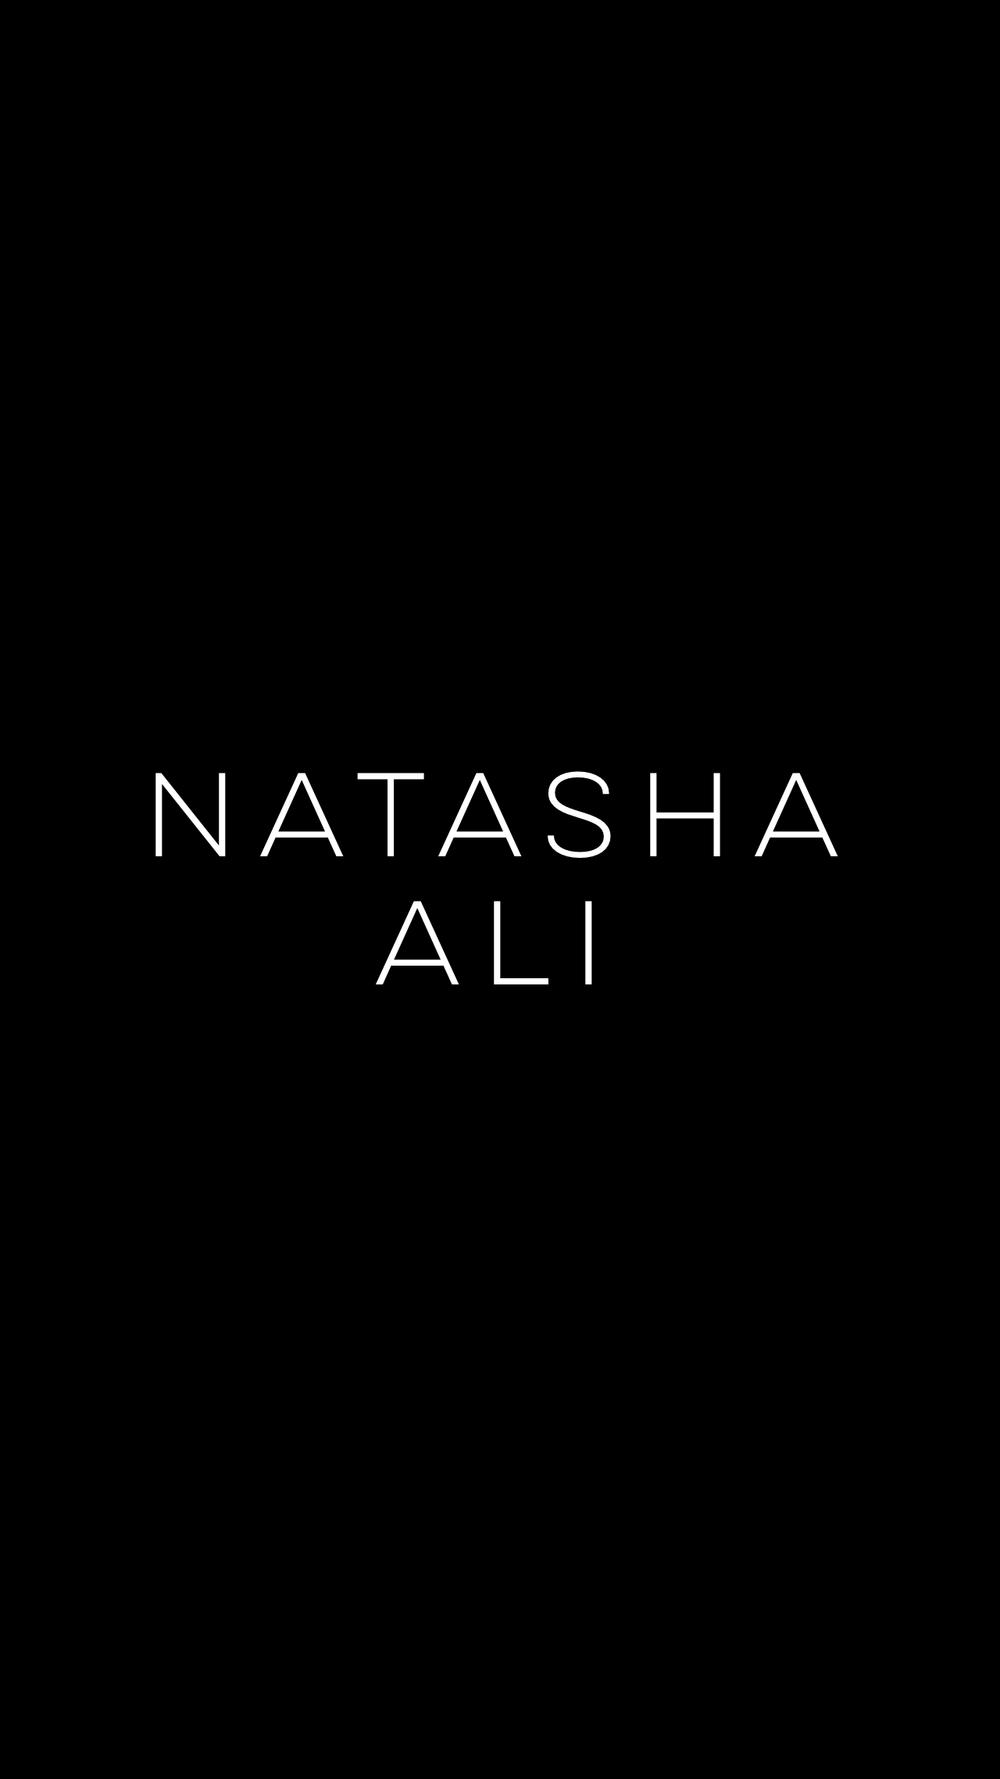 NATASHA ALI.jpg